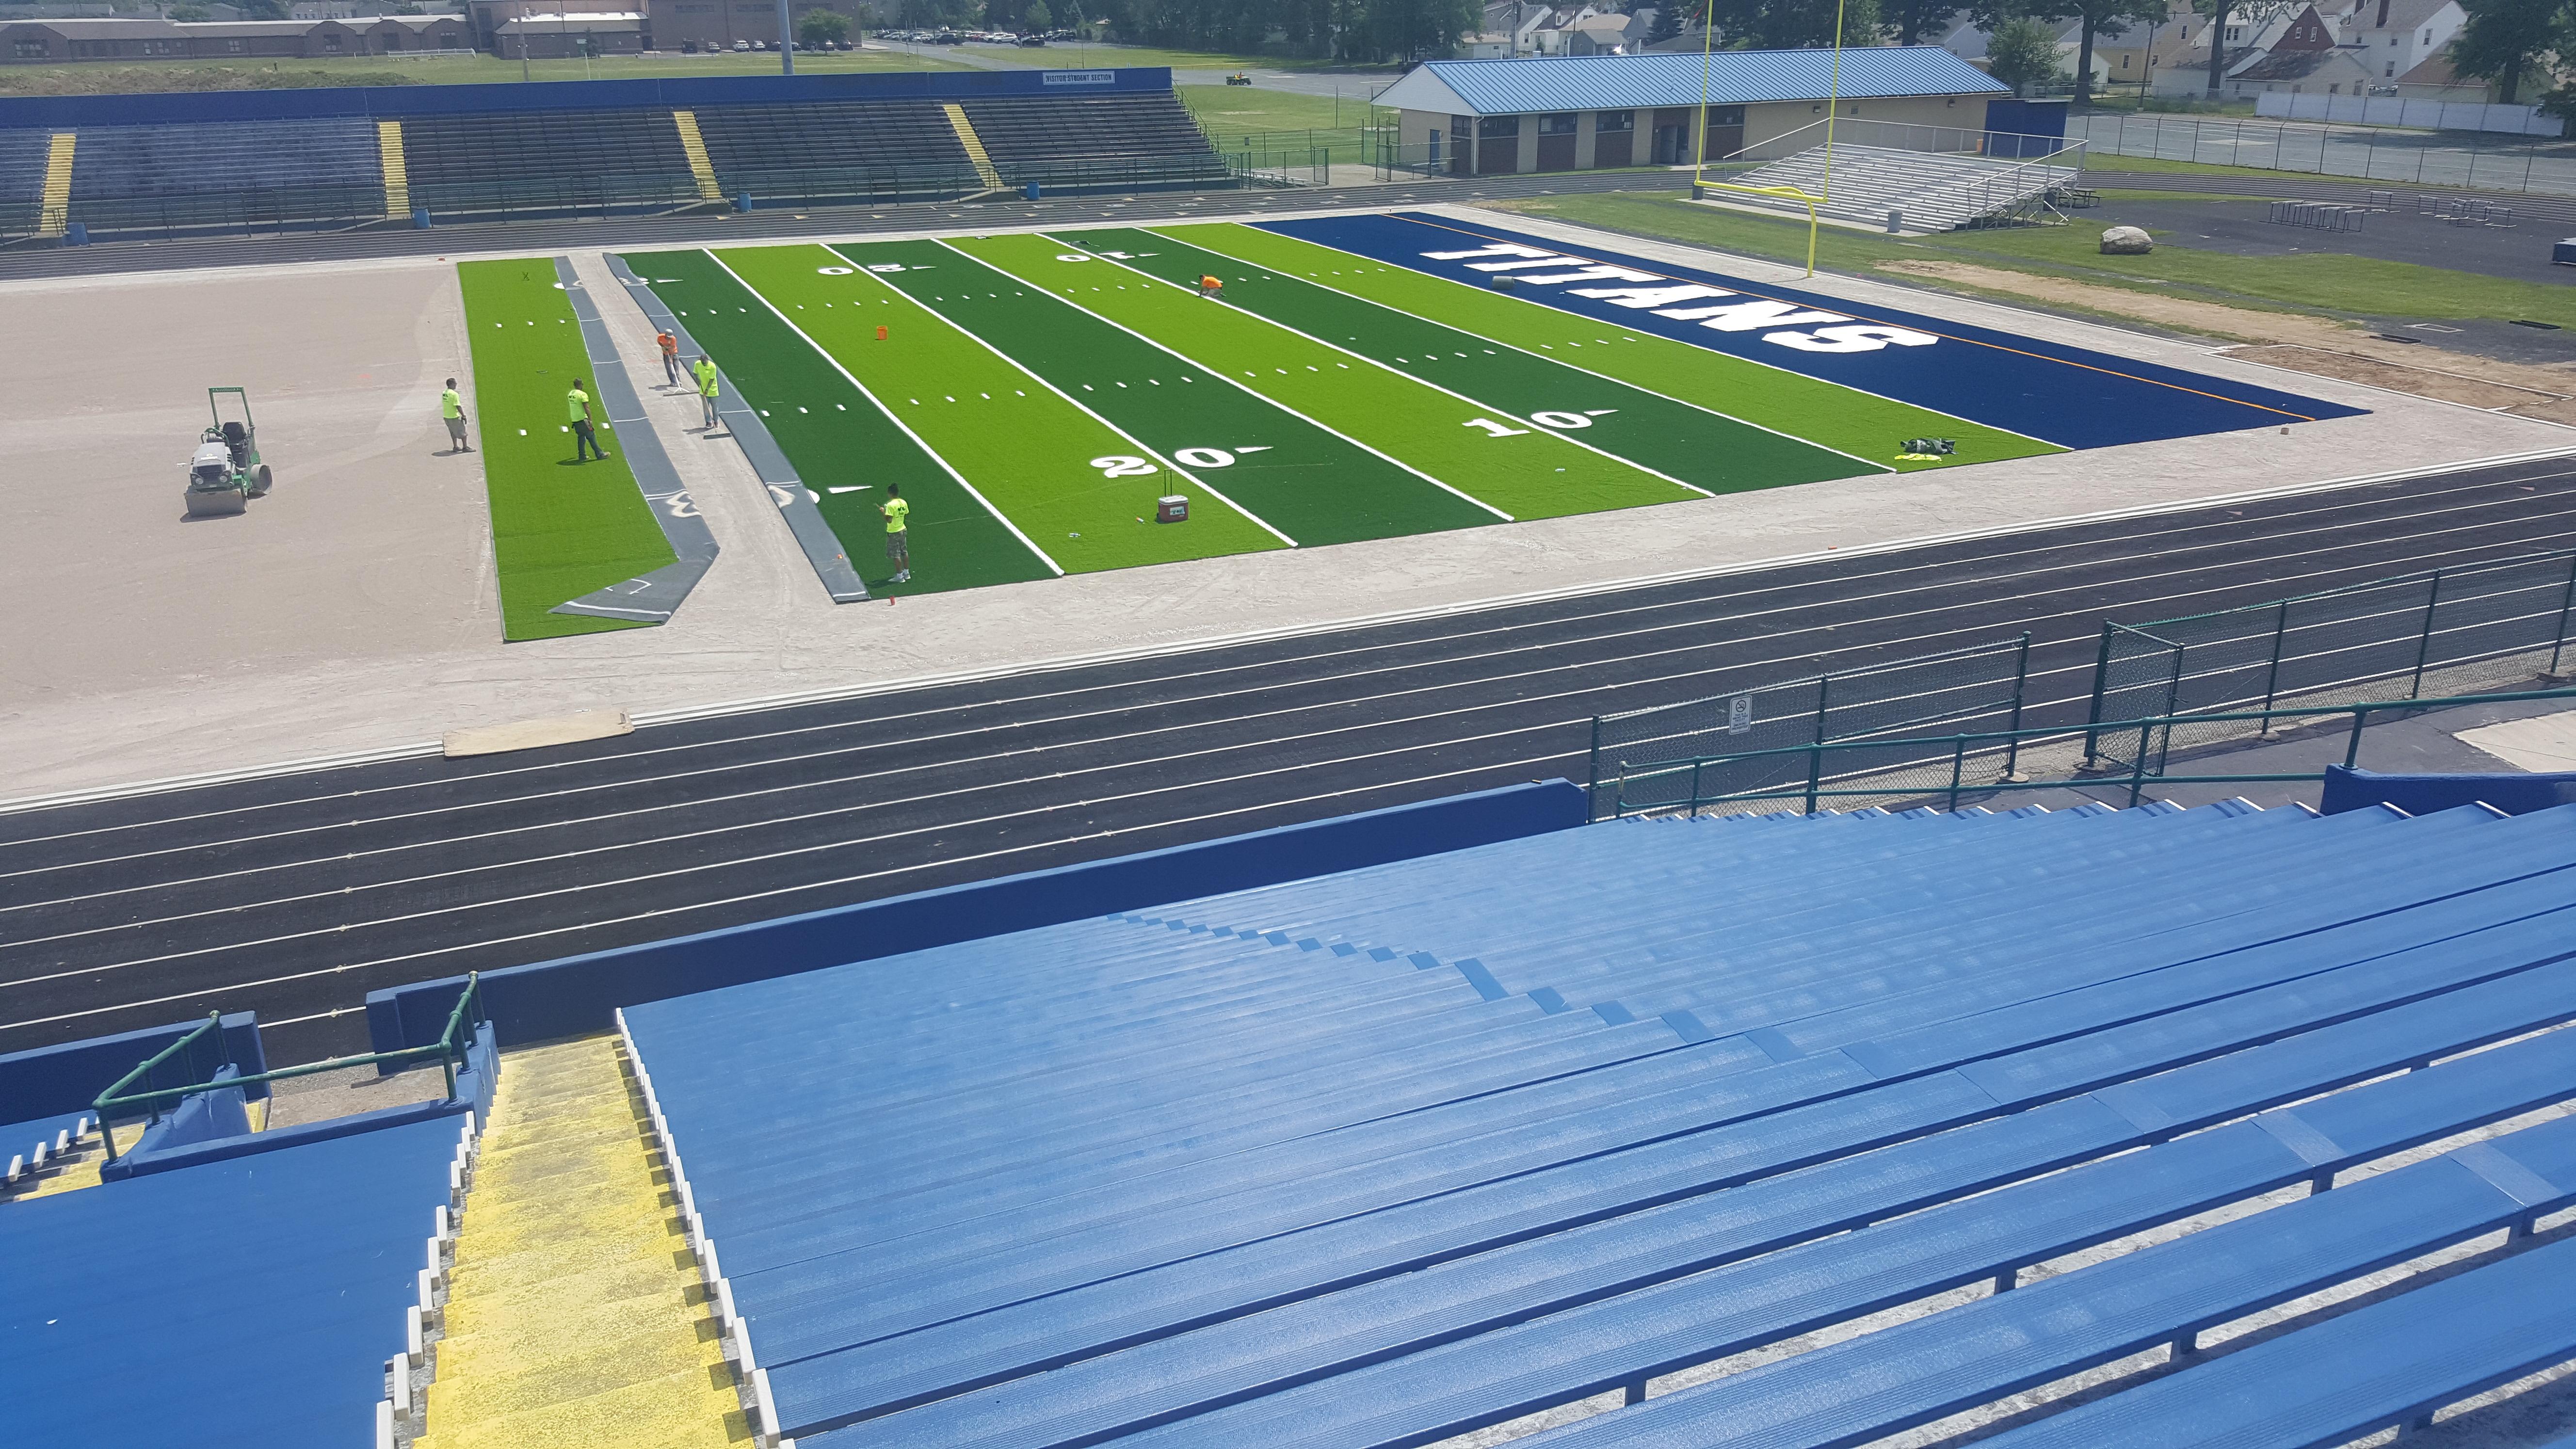 Stadium Turf Project